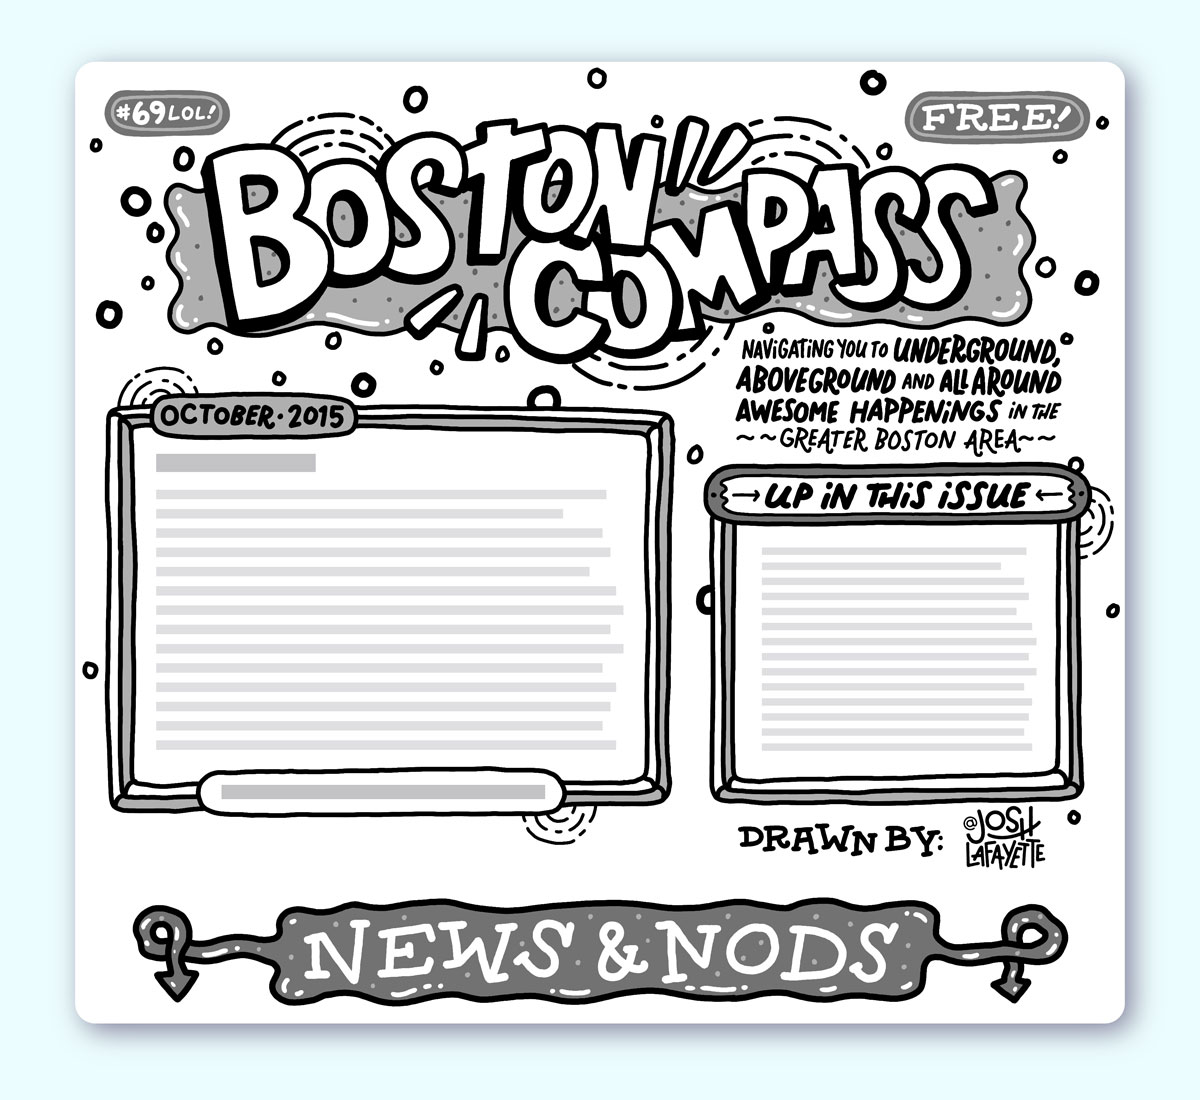 BostonCompass-FullDigital.jpg